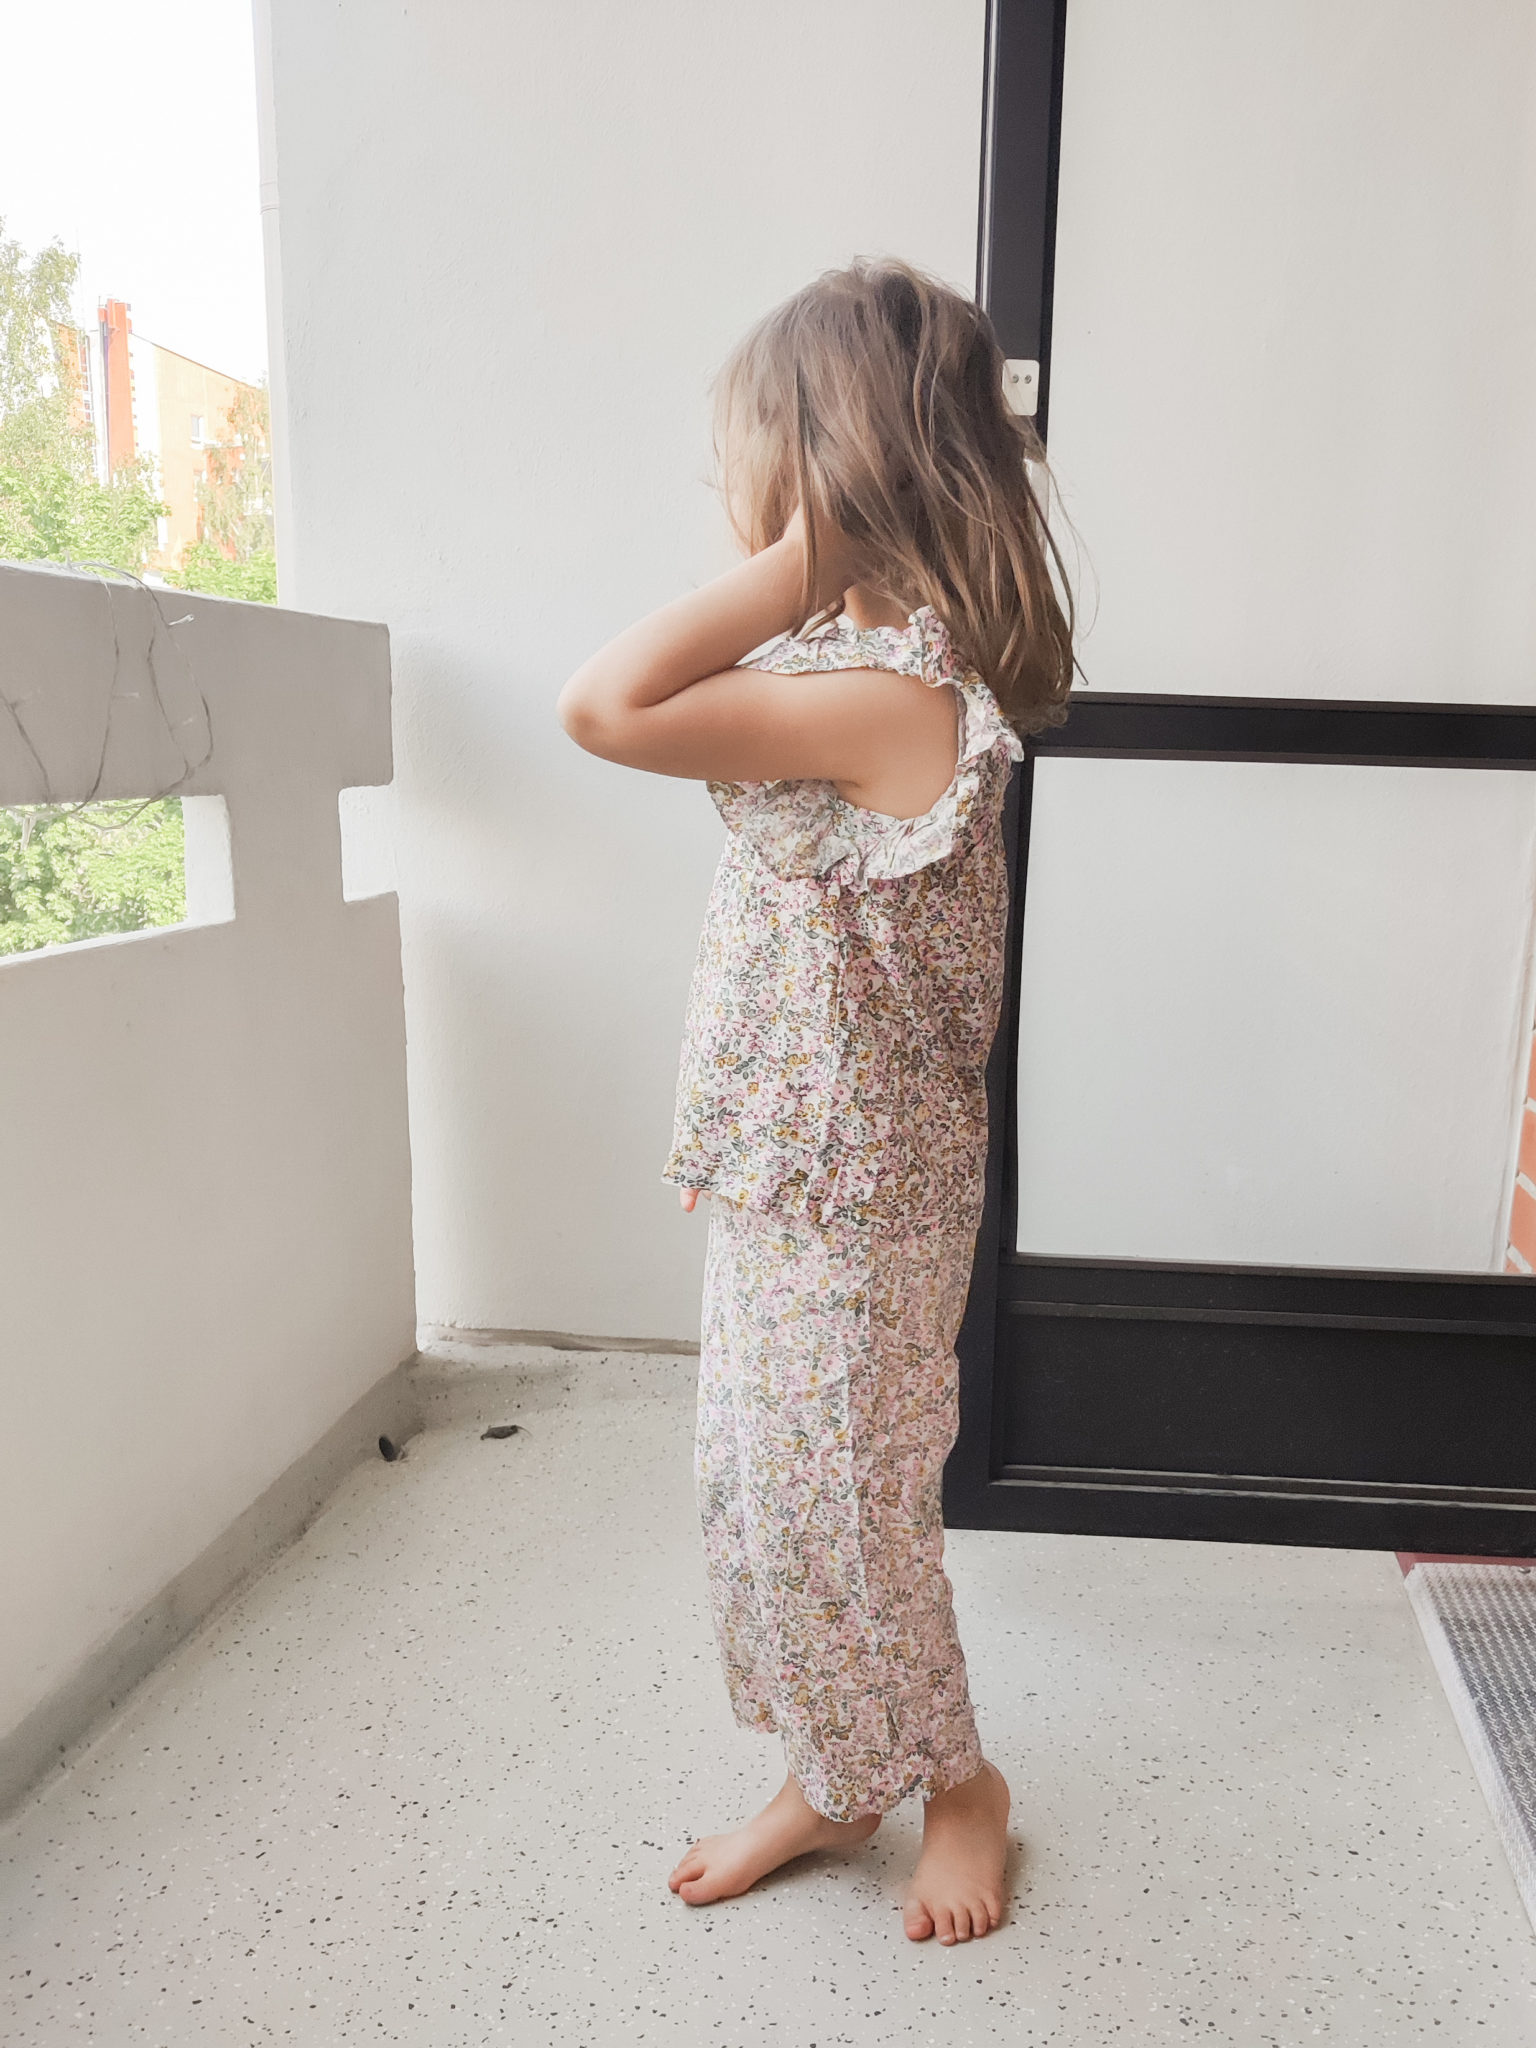 Viikon parhaat - Lasten vaatteet - BMH - Big mamas home by Jenni